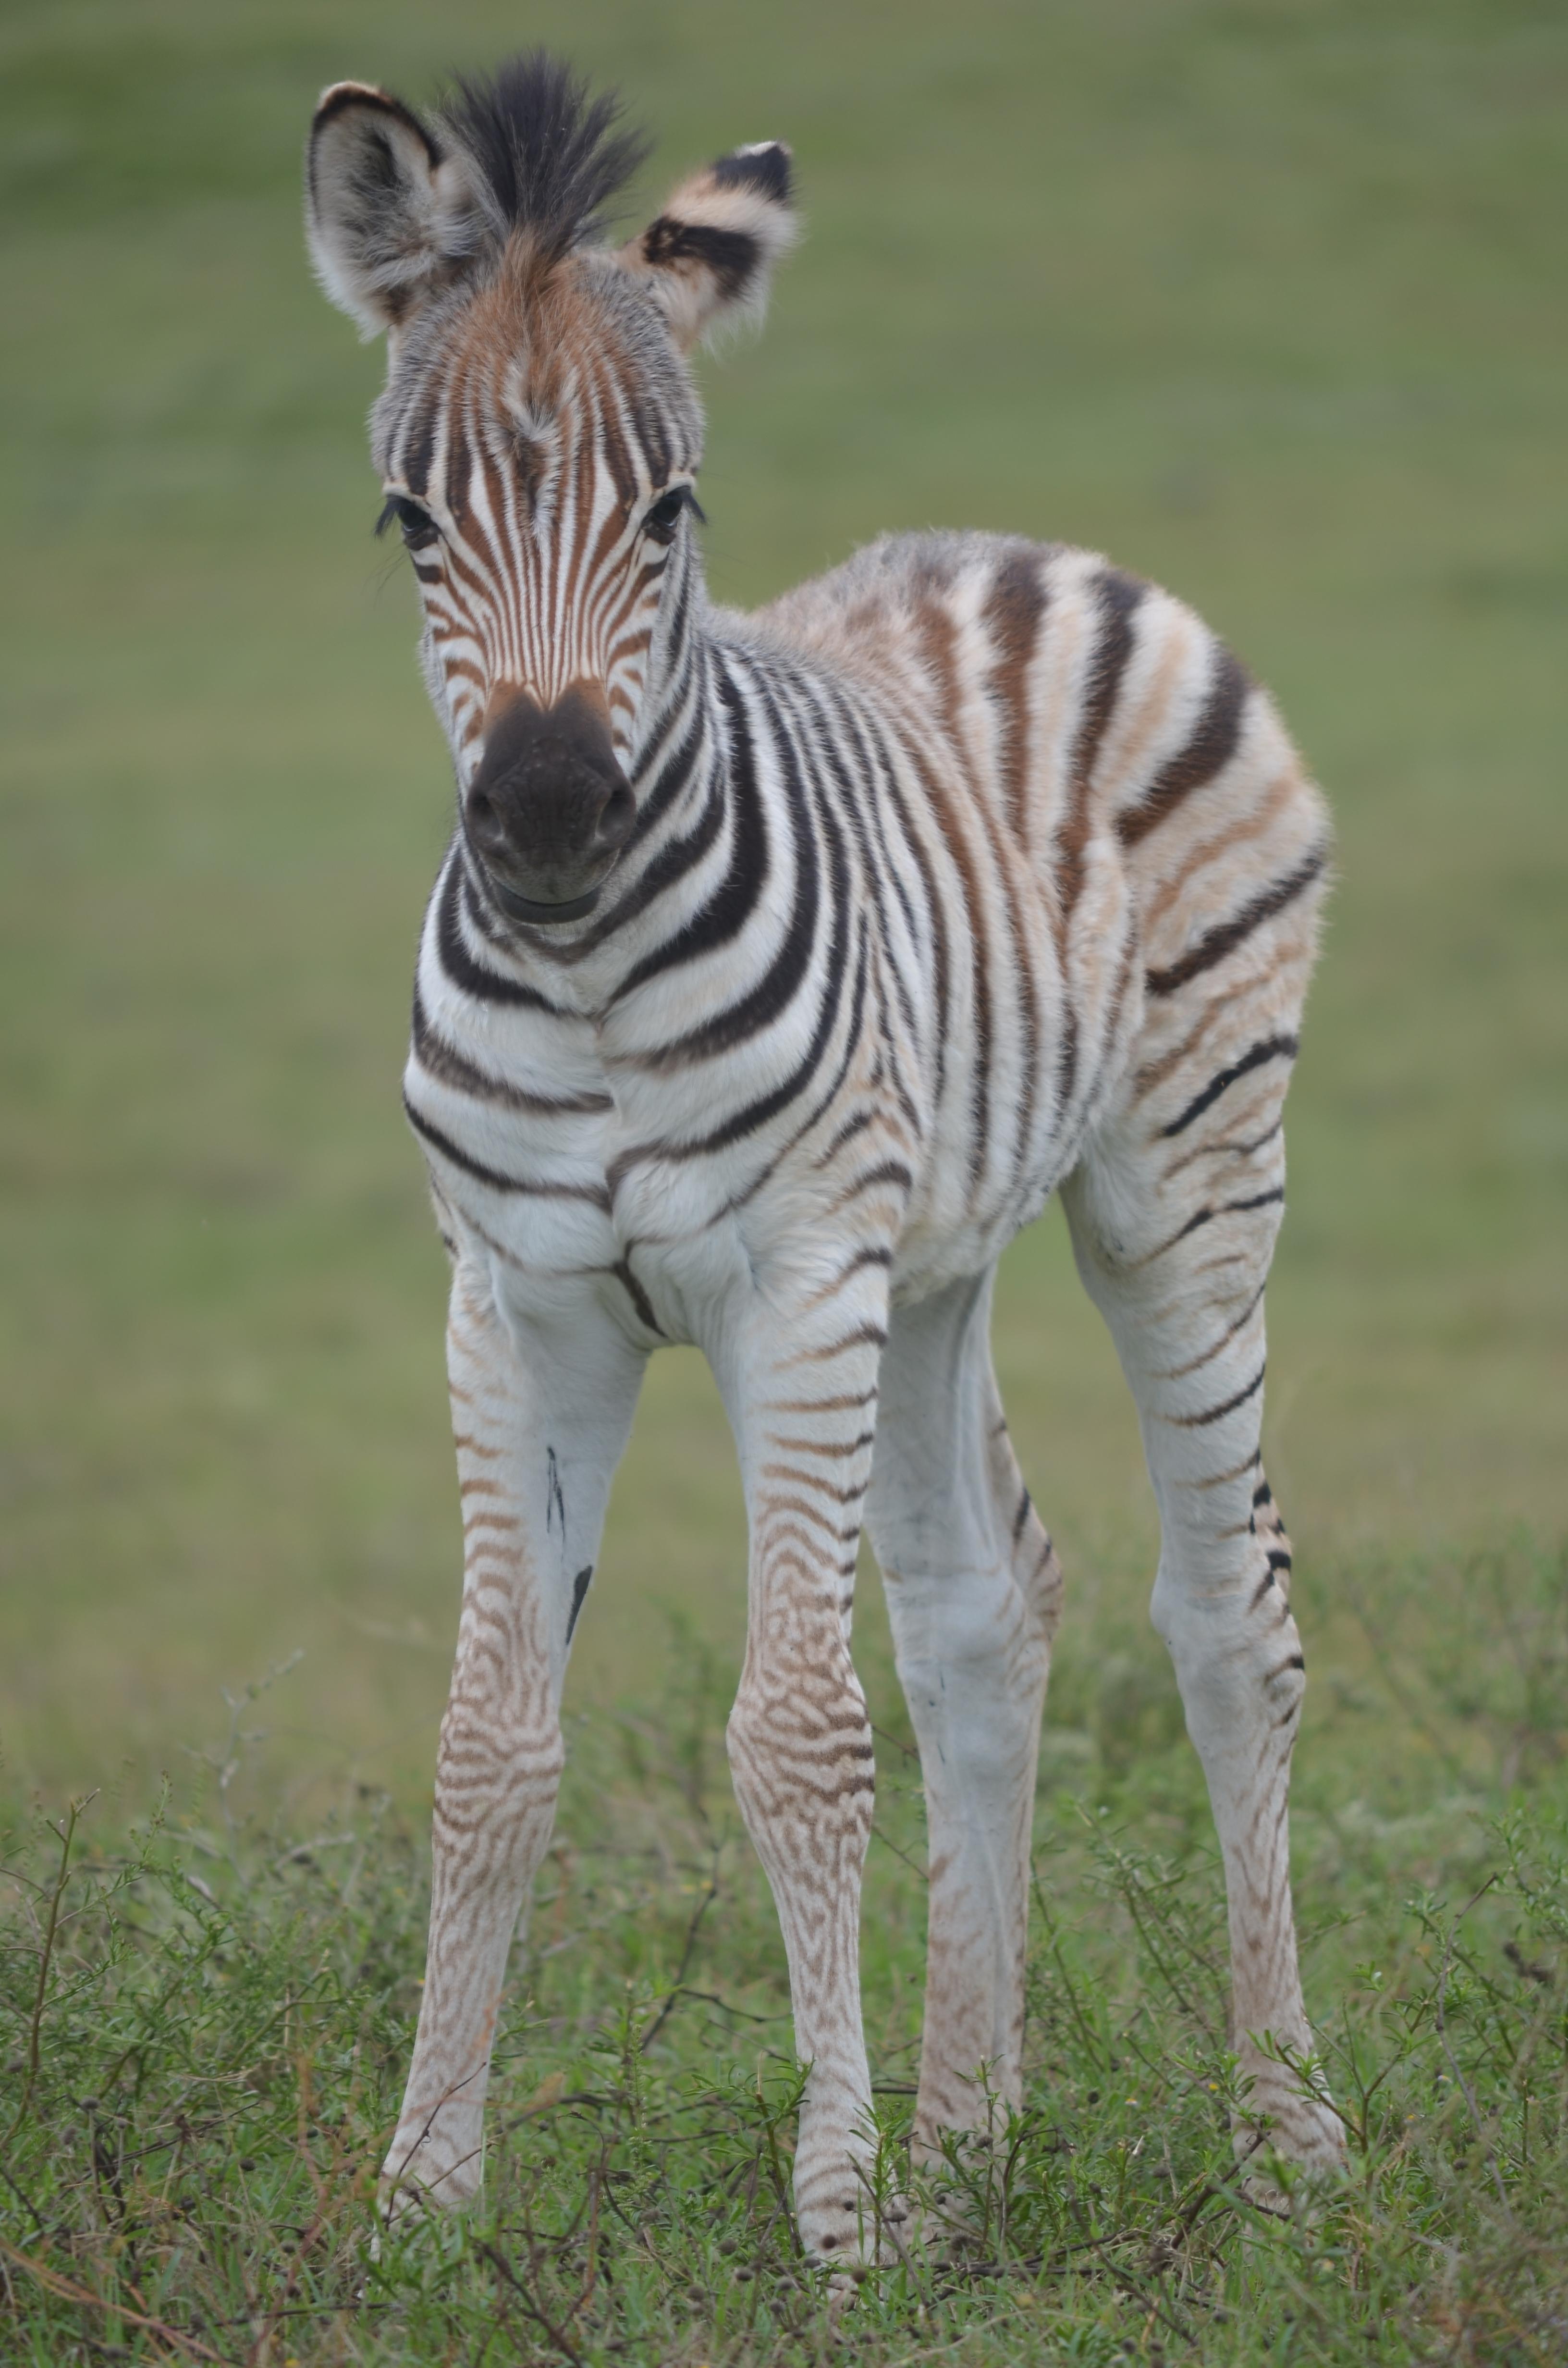 Baby Zebras In Africa Baby Zebras In Africa